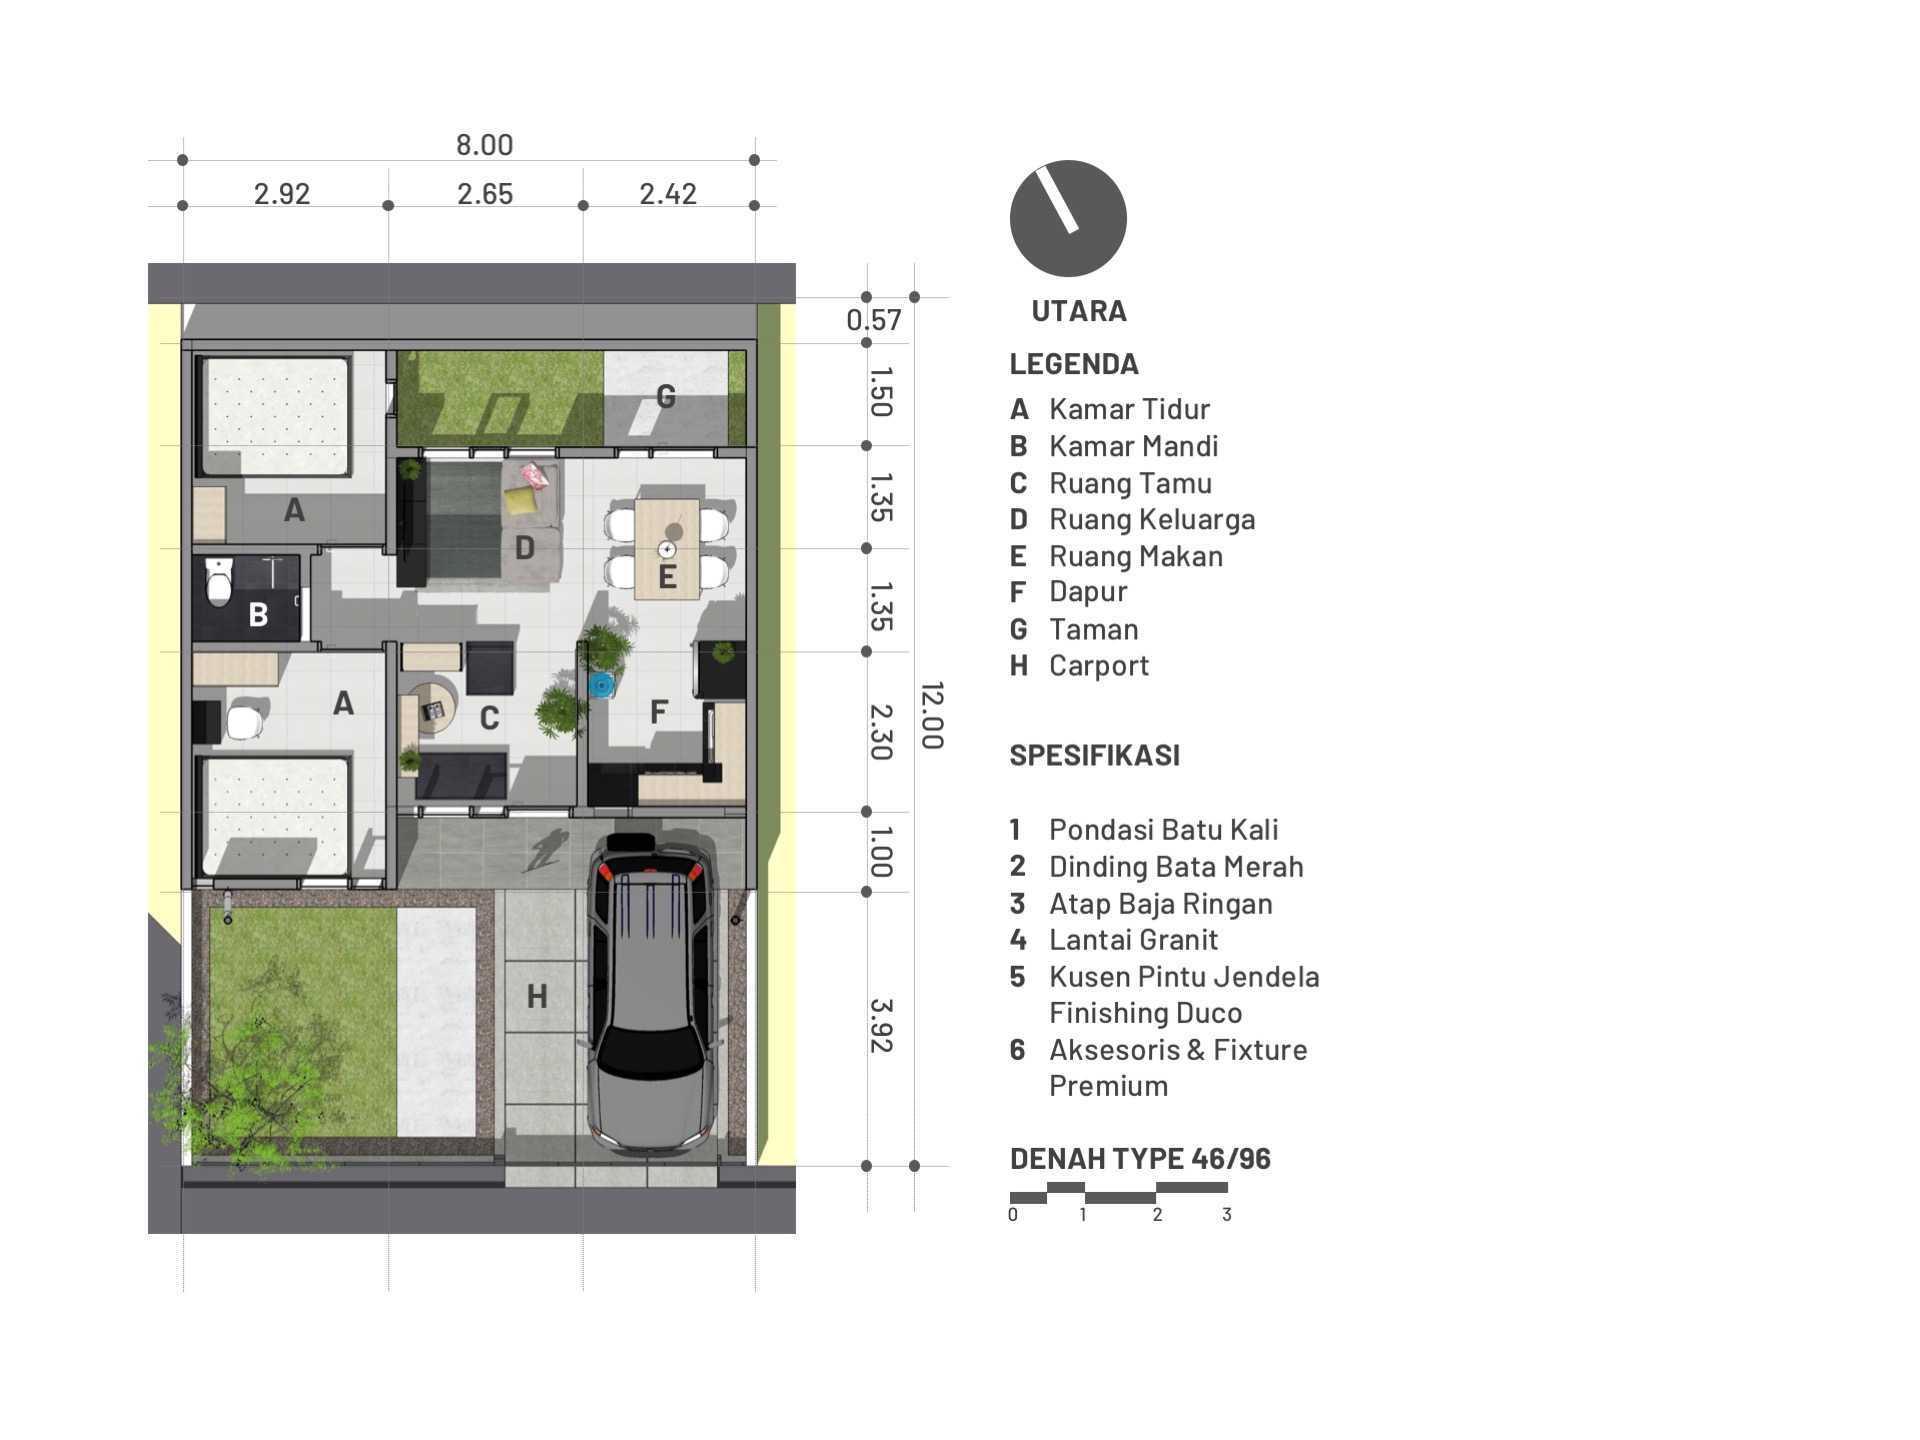 Mid Works Gmw House Jatihandap, Kec. Mandalajati, Kota Bandung, Jawa Barat, Indonesia Jatihandap, Kec. Mandalajati, Kota Bandung, Jawa Barat, Indonesia Mid-Works-Gmw-House  94663